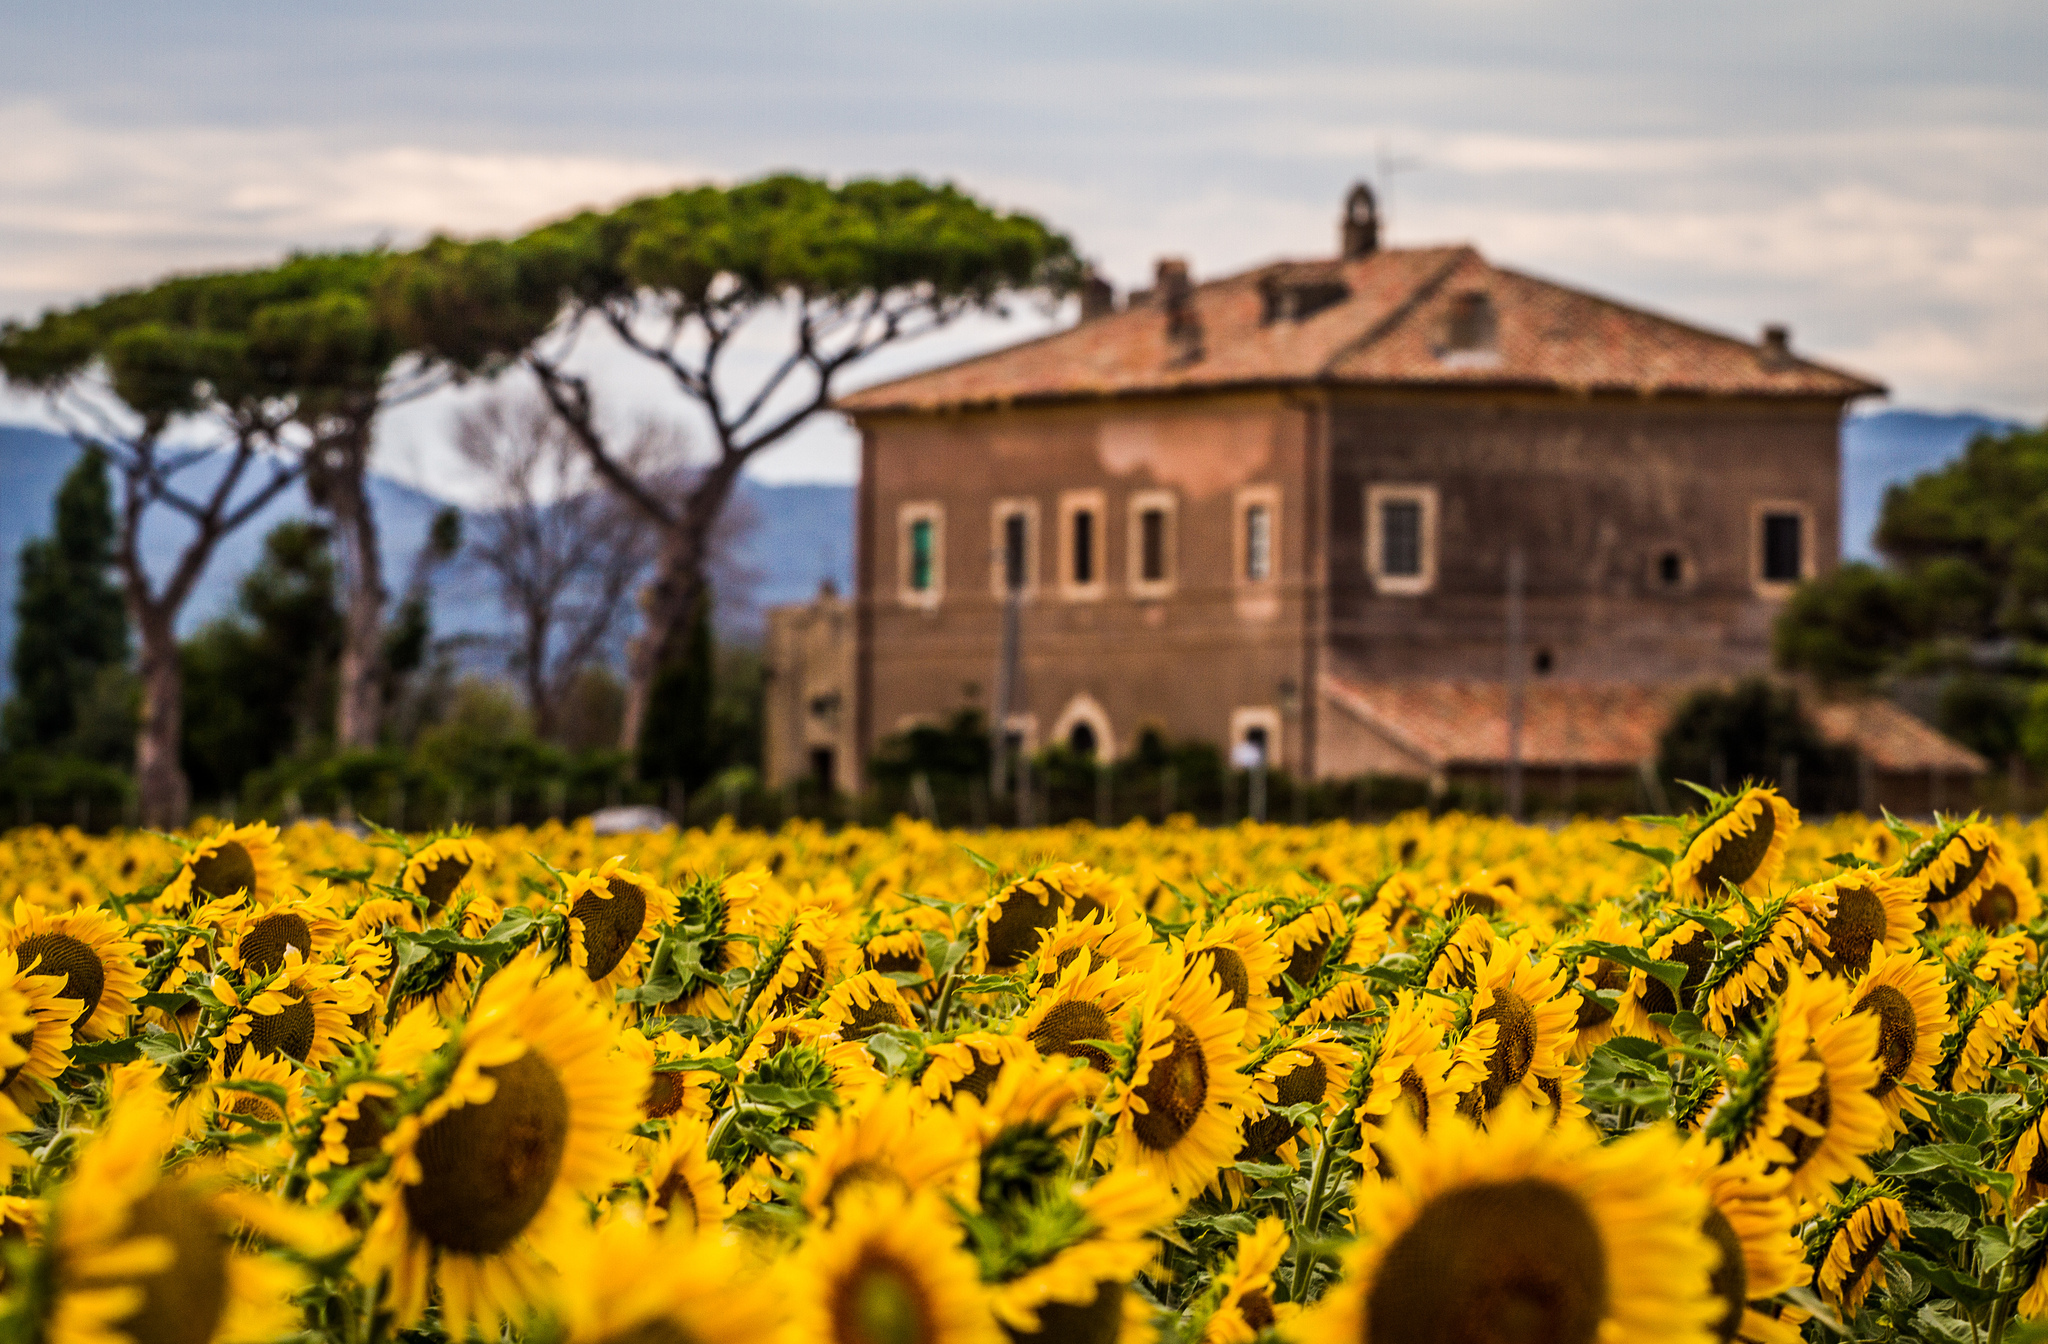 Photos Flowers Helianthus Building flower Sunflowers Houses